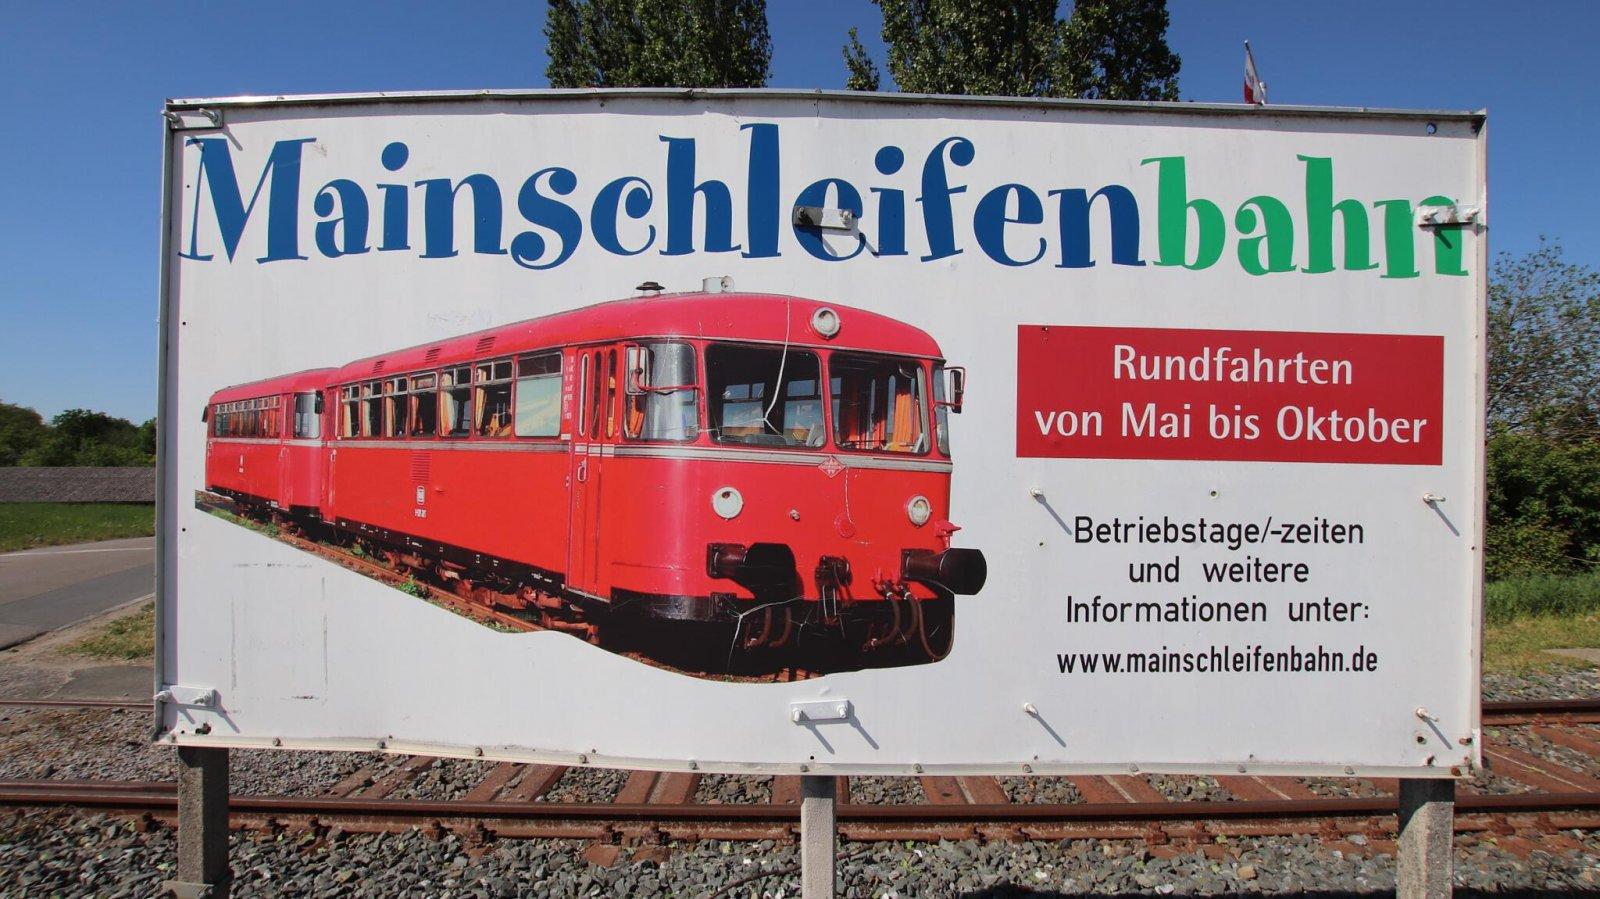 Mainschleifenbahn.jpg